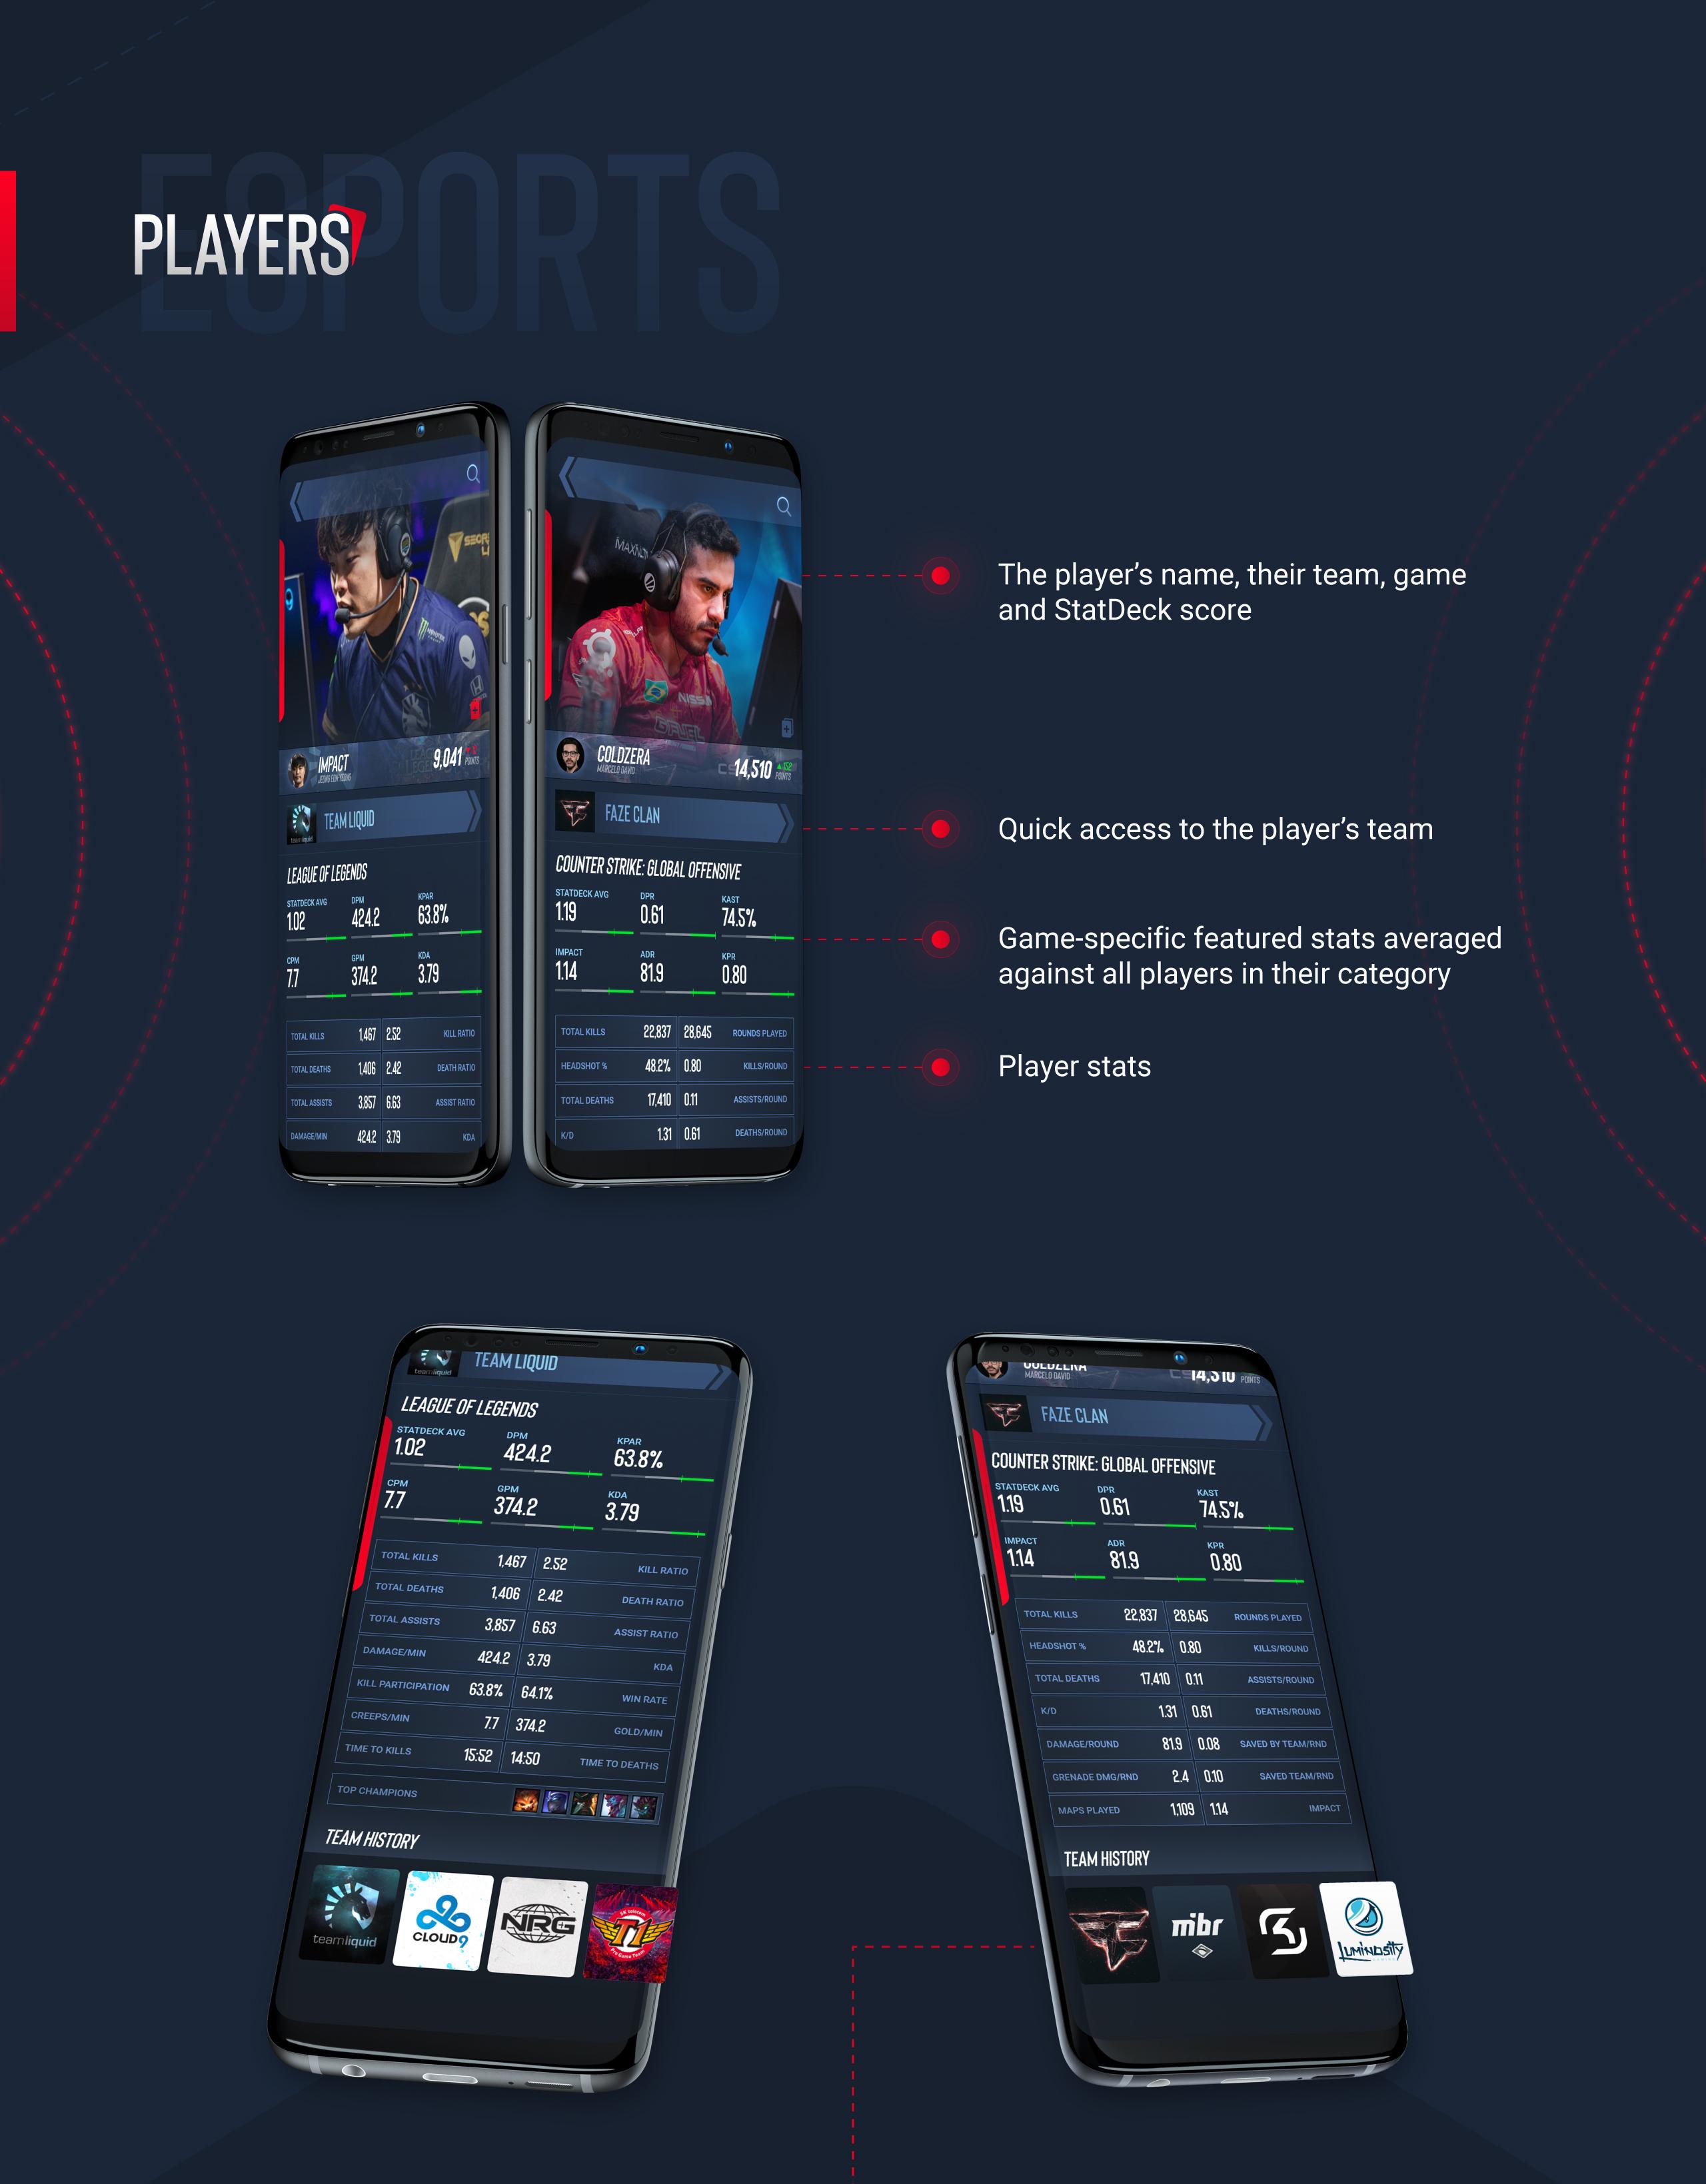 Statdeck screens - eSports players